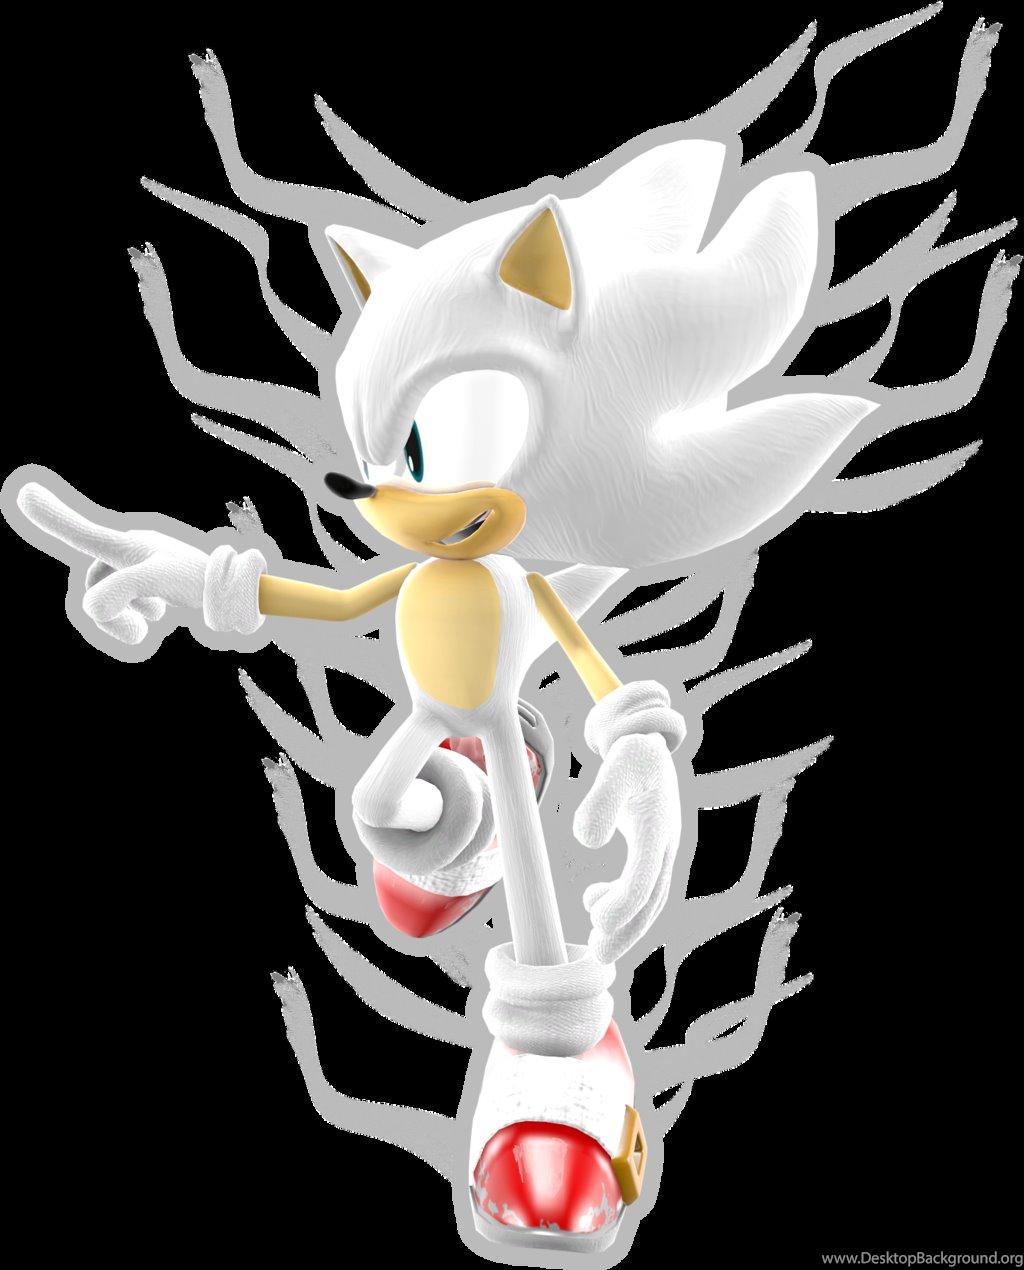 Hyper Sonic The Hedgehog By Super Fox Layer100 On Deviantart Desktop Background